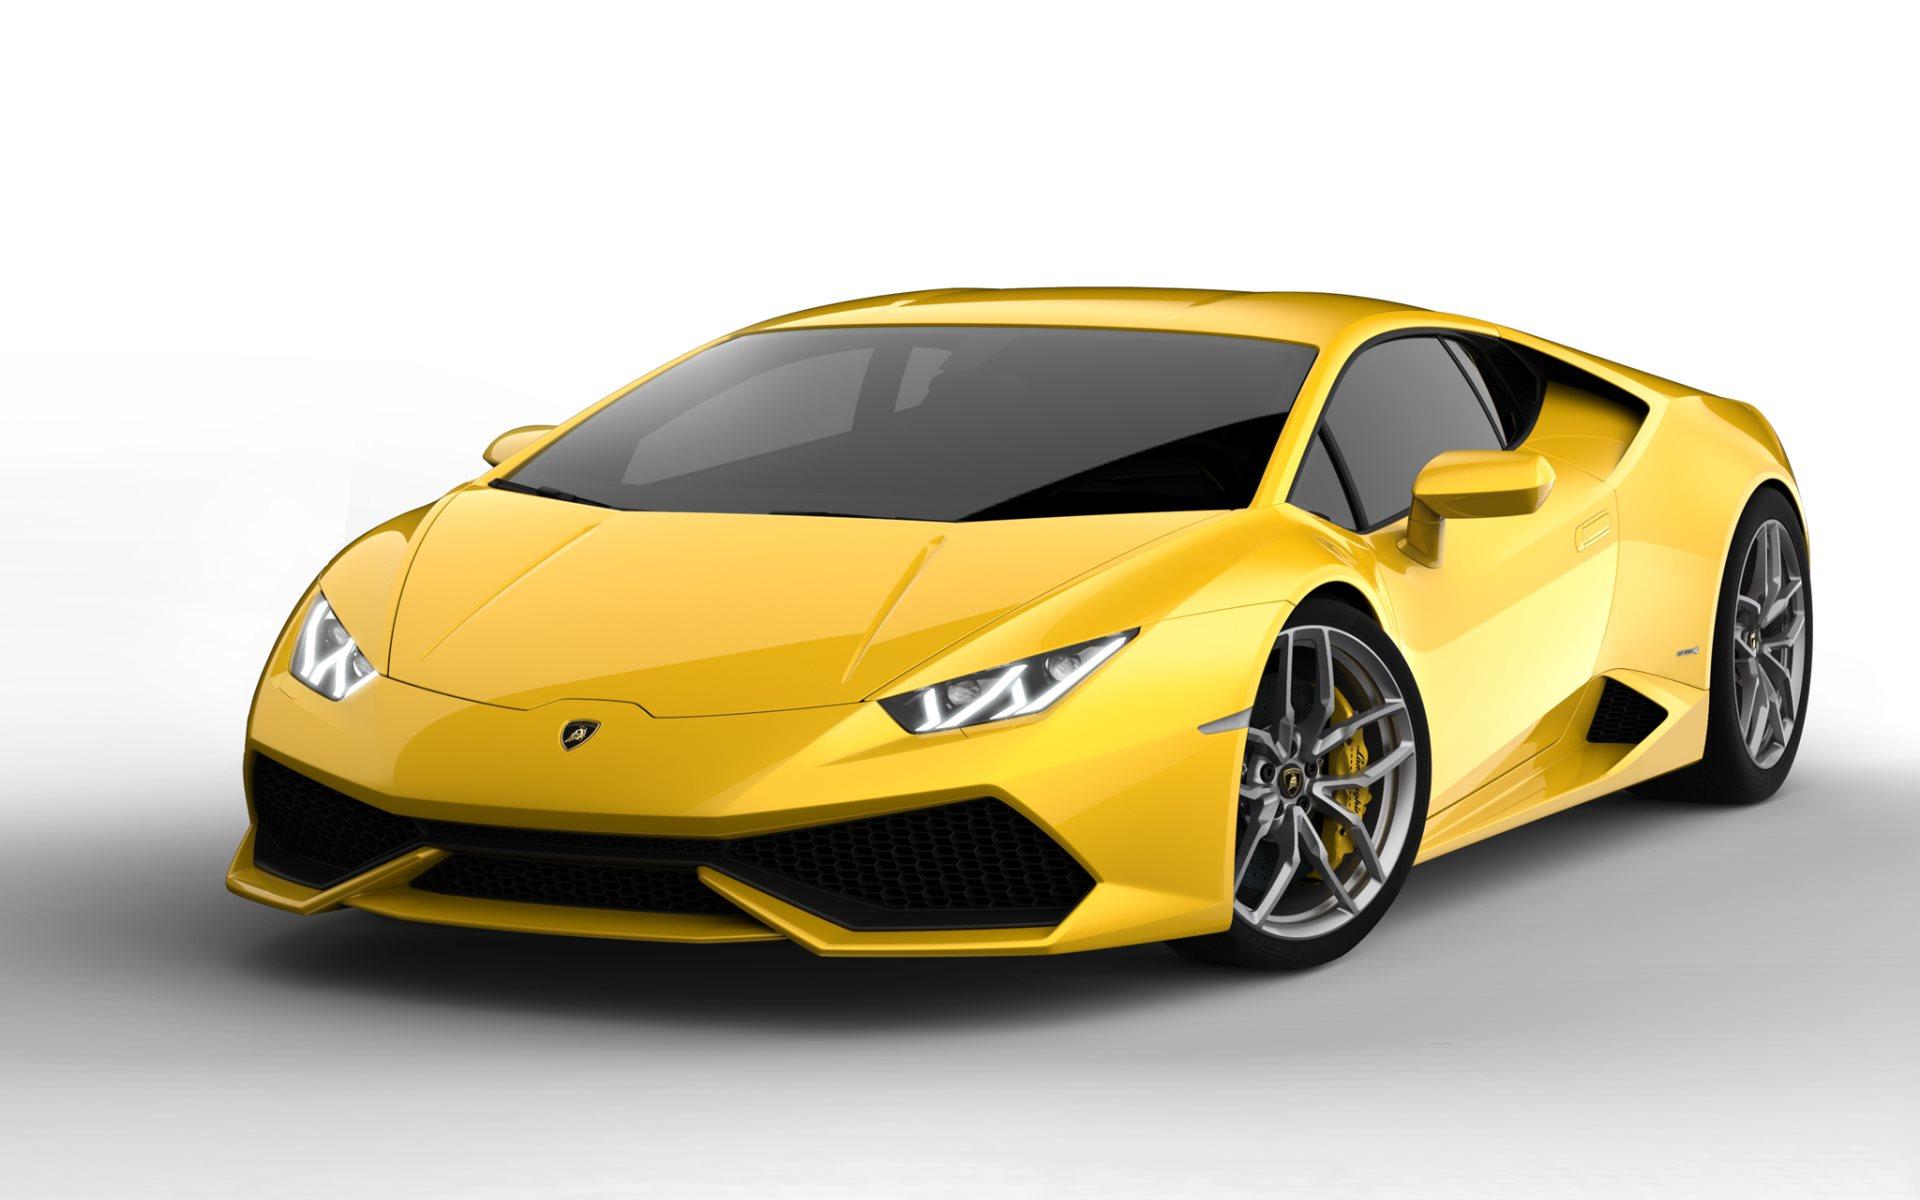 Lamborghini+Hurac%25C3%25A1n Breathtaking Price Of Lamborghini Huracán Lp 610 4 Cars Trend